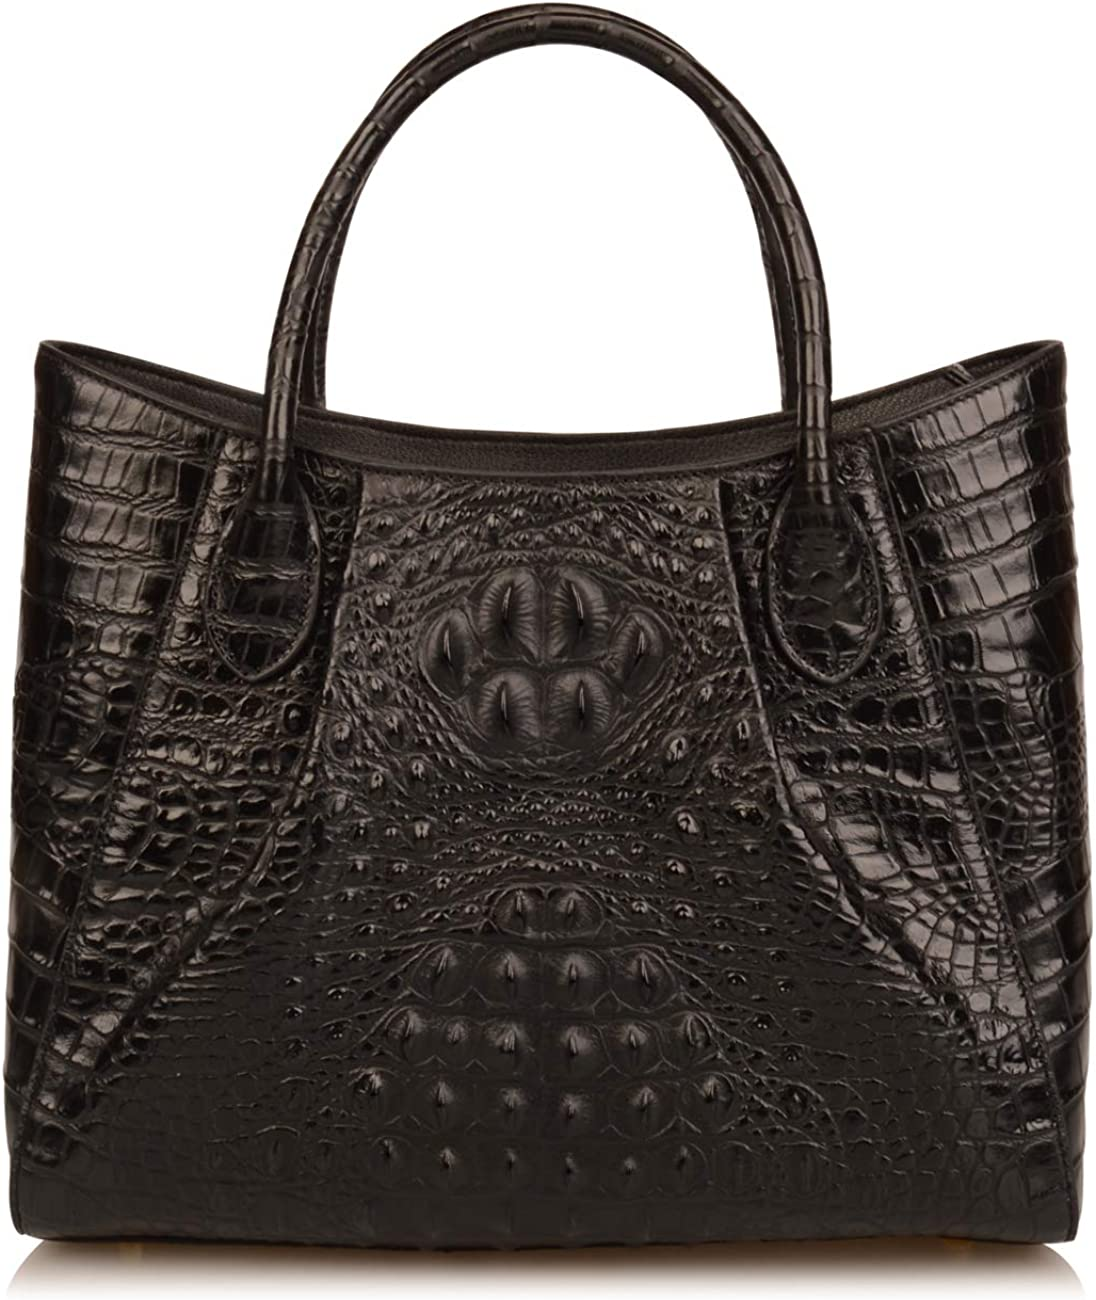 Ainifeel Women's Crocodile Embossed Genuine Leather Purse Top Handle Handbags Totes Shoulder Bags Everyday Purses